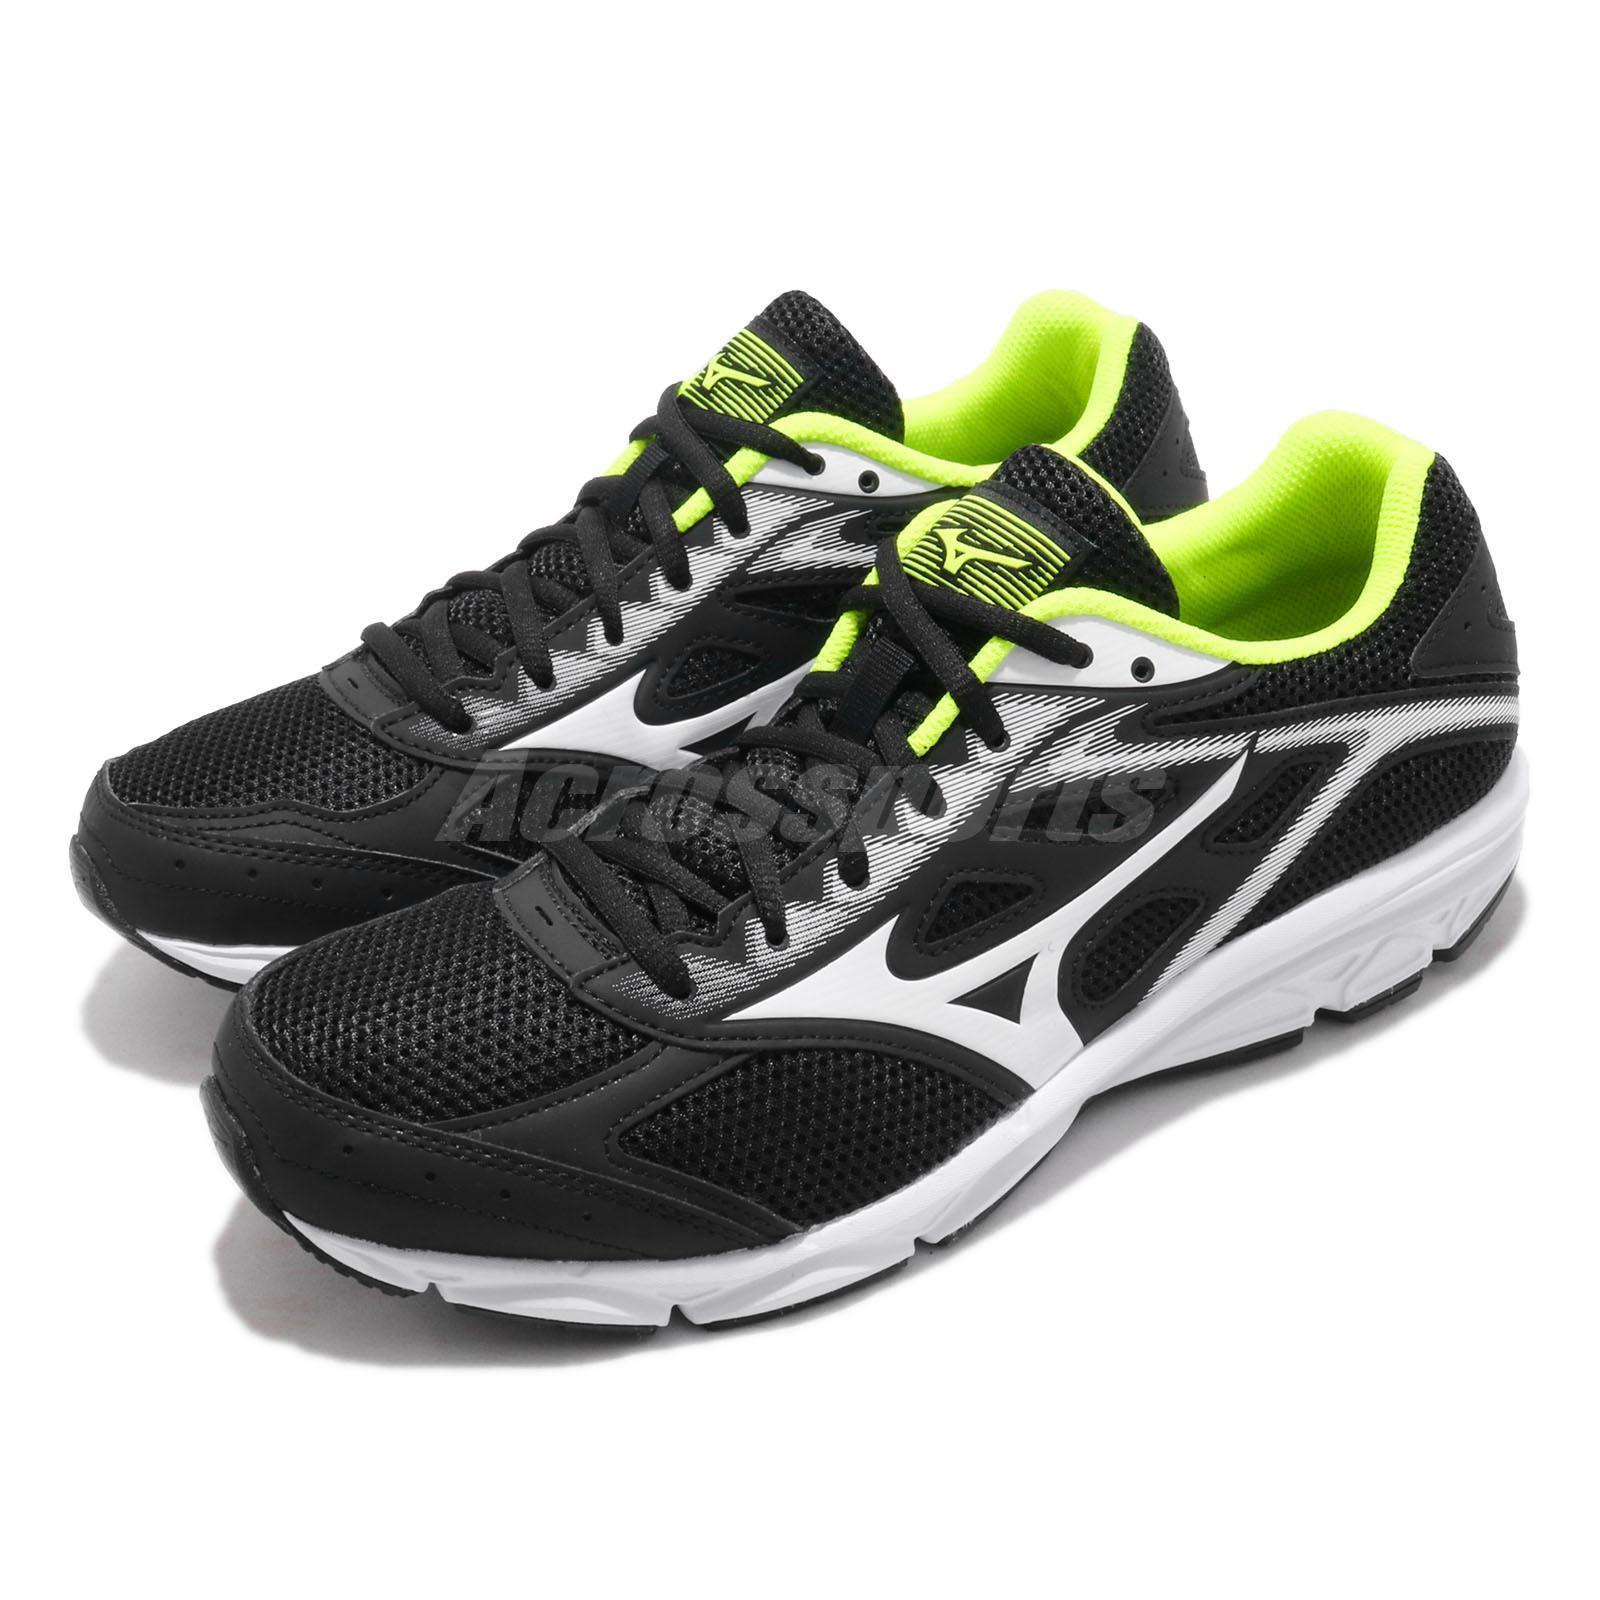 Mizuno Maximizer 21 Wide Black White Yellow Men Running shoes Sneaker K1GA1900-02